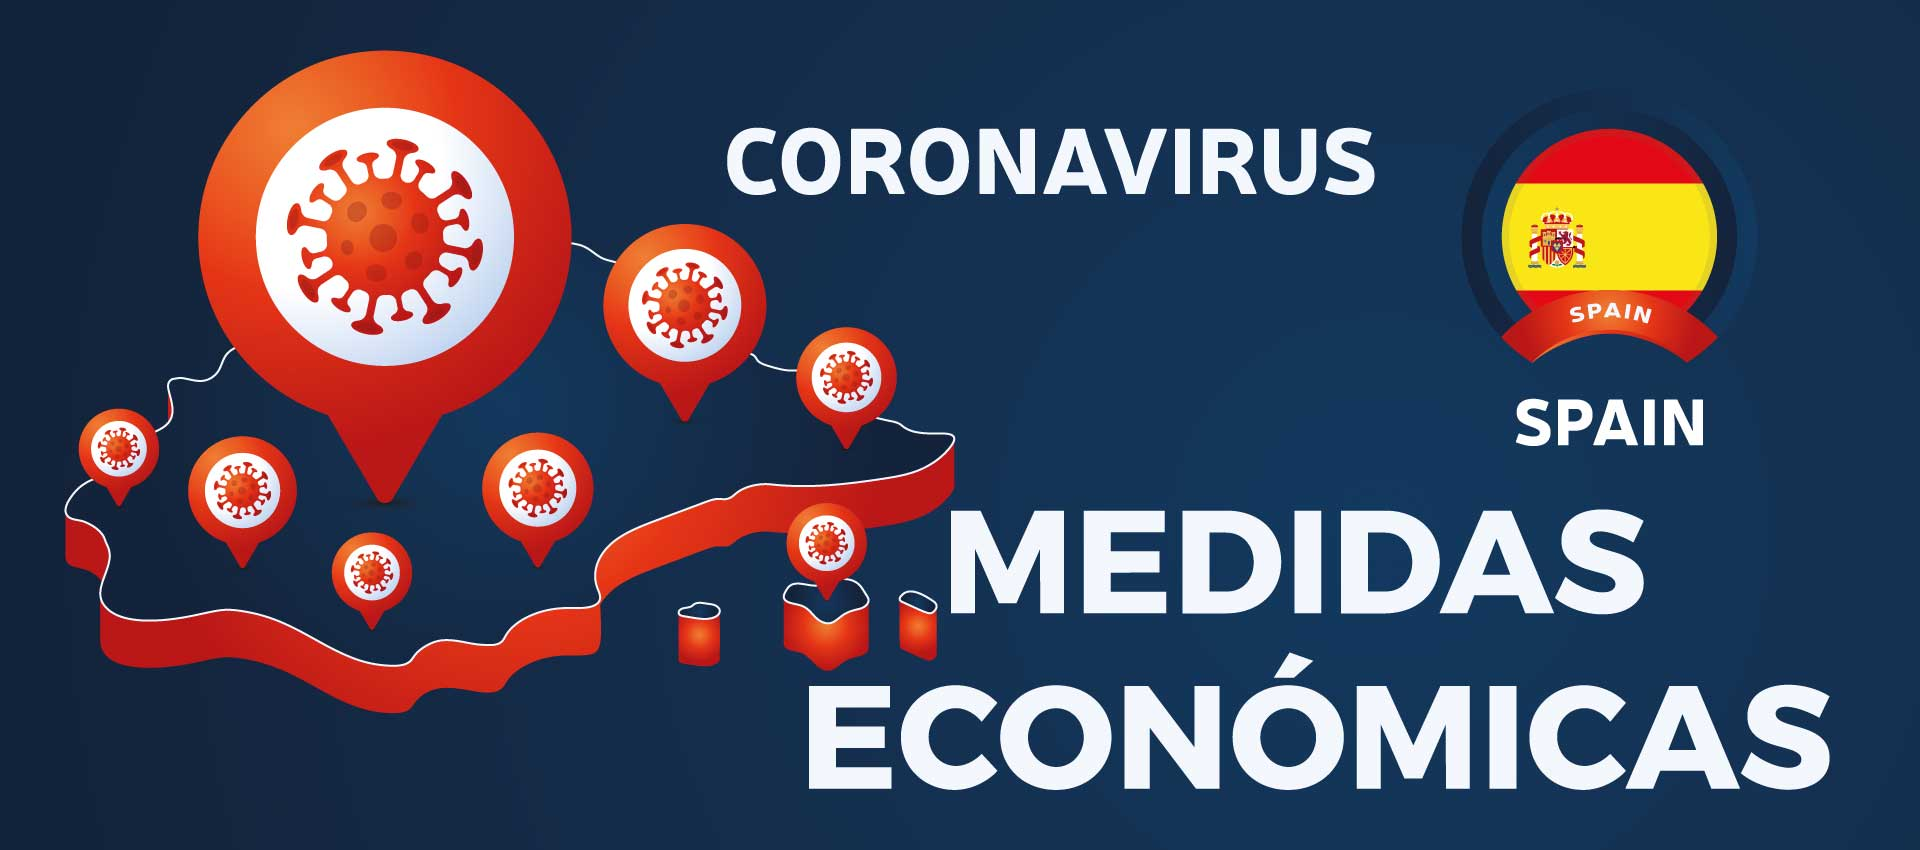 medidas-economicas-coronavirus